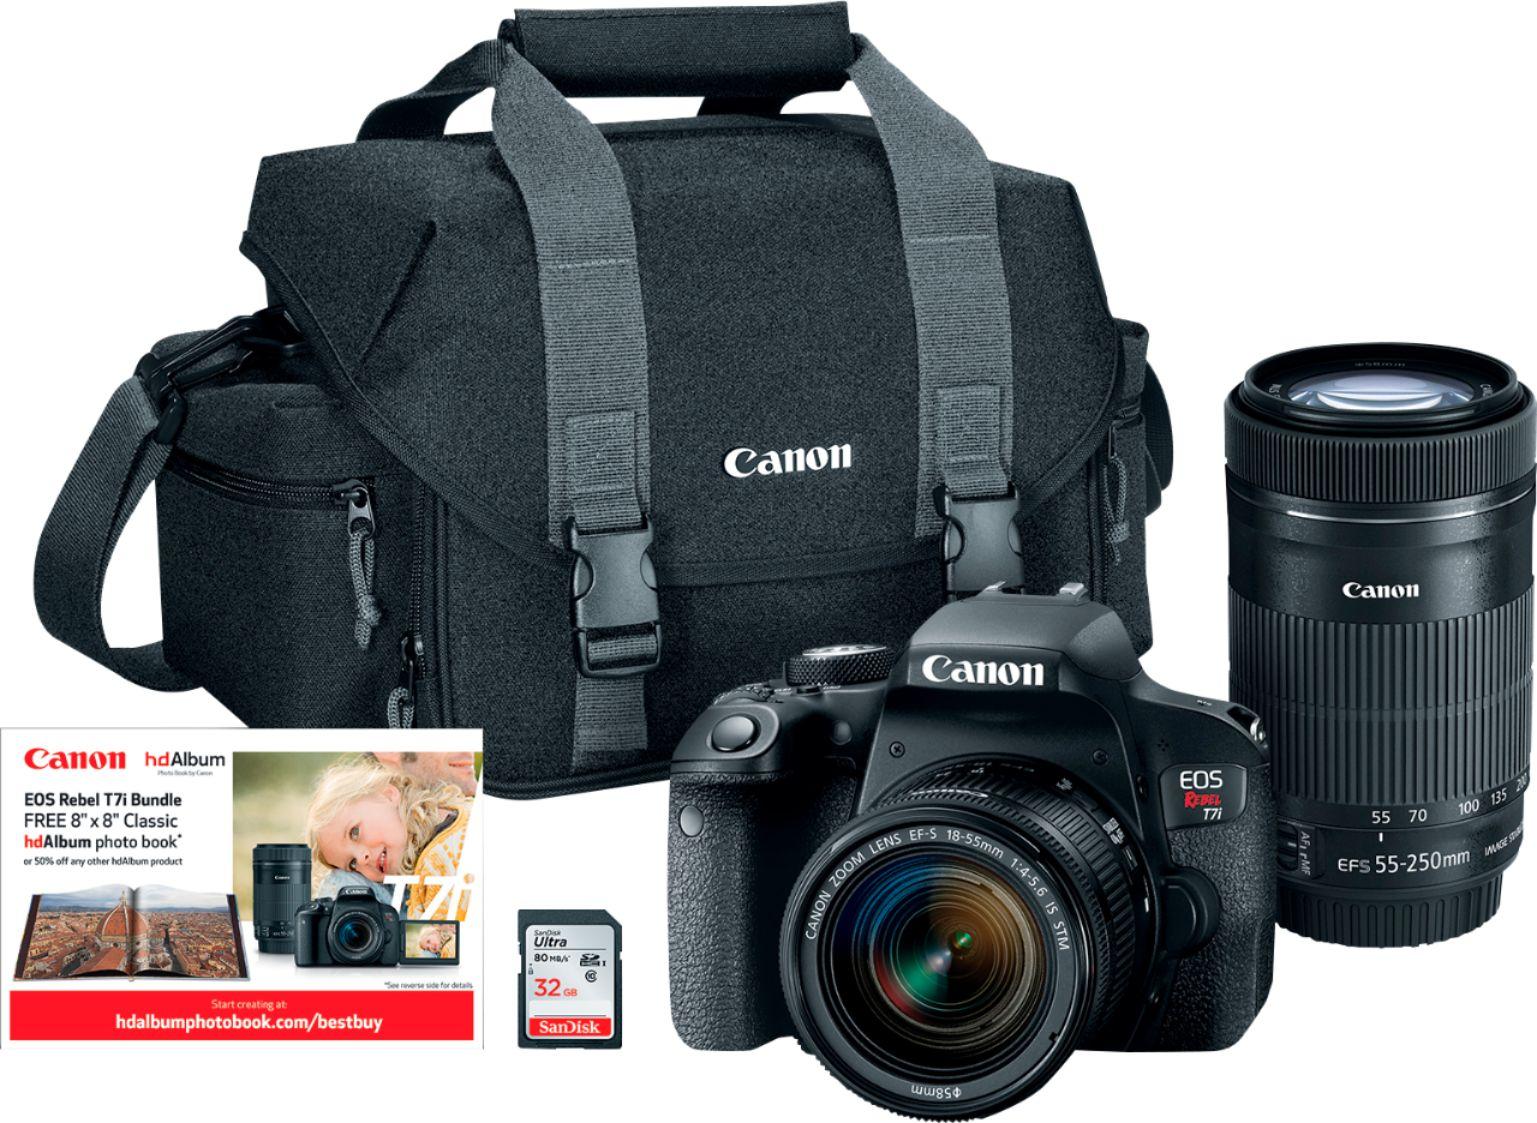 $699 Canon EOS Rebel T7i DSLR Two Lens Kit with 18-55mm and 55-250mm Lenses Black 1894C056 - Best Buy